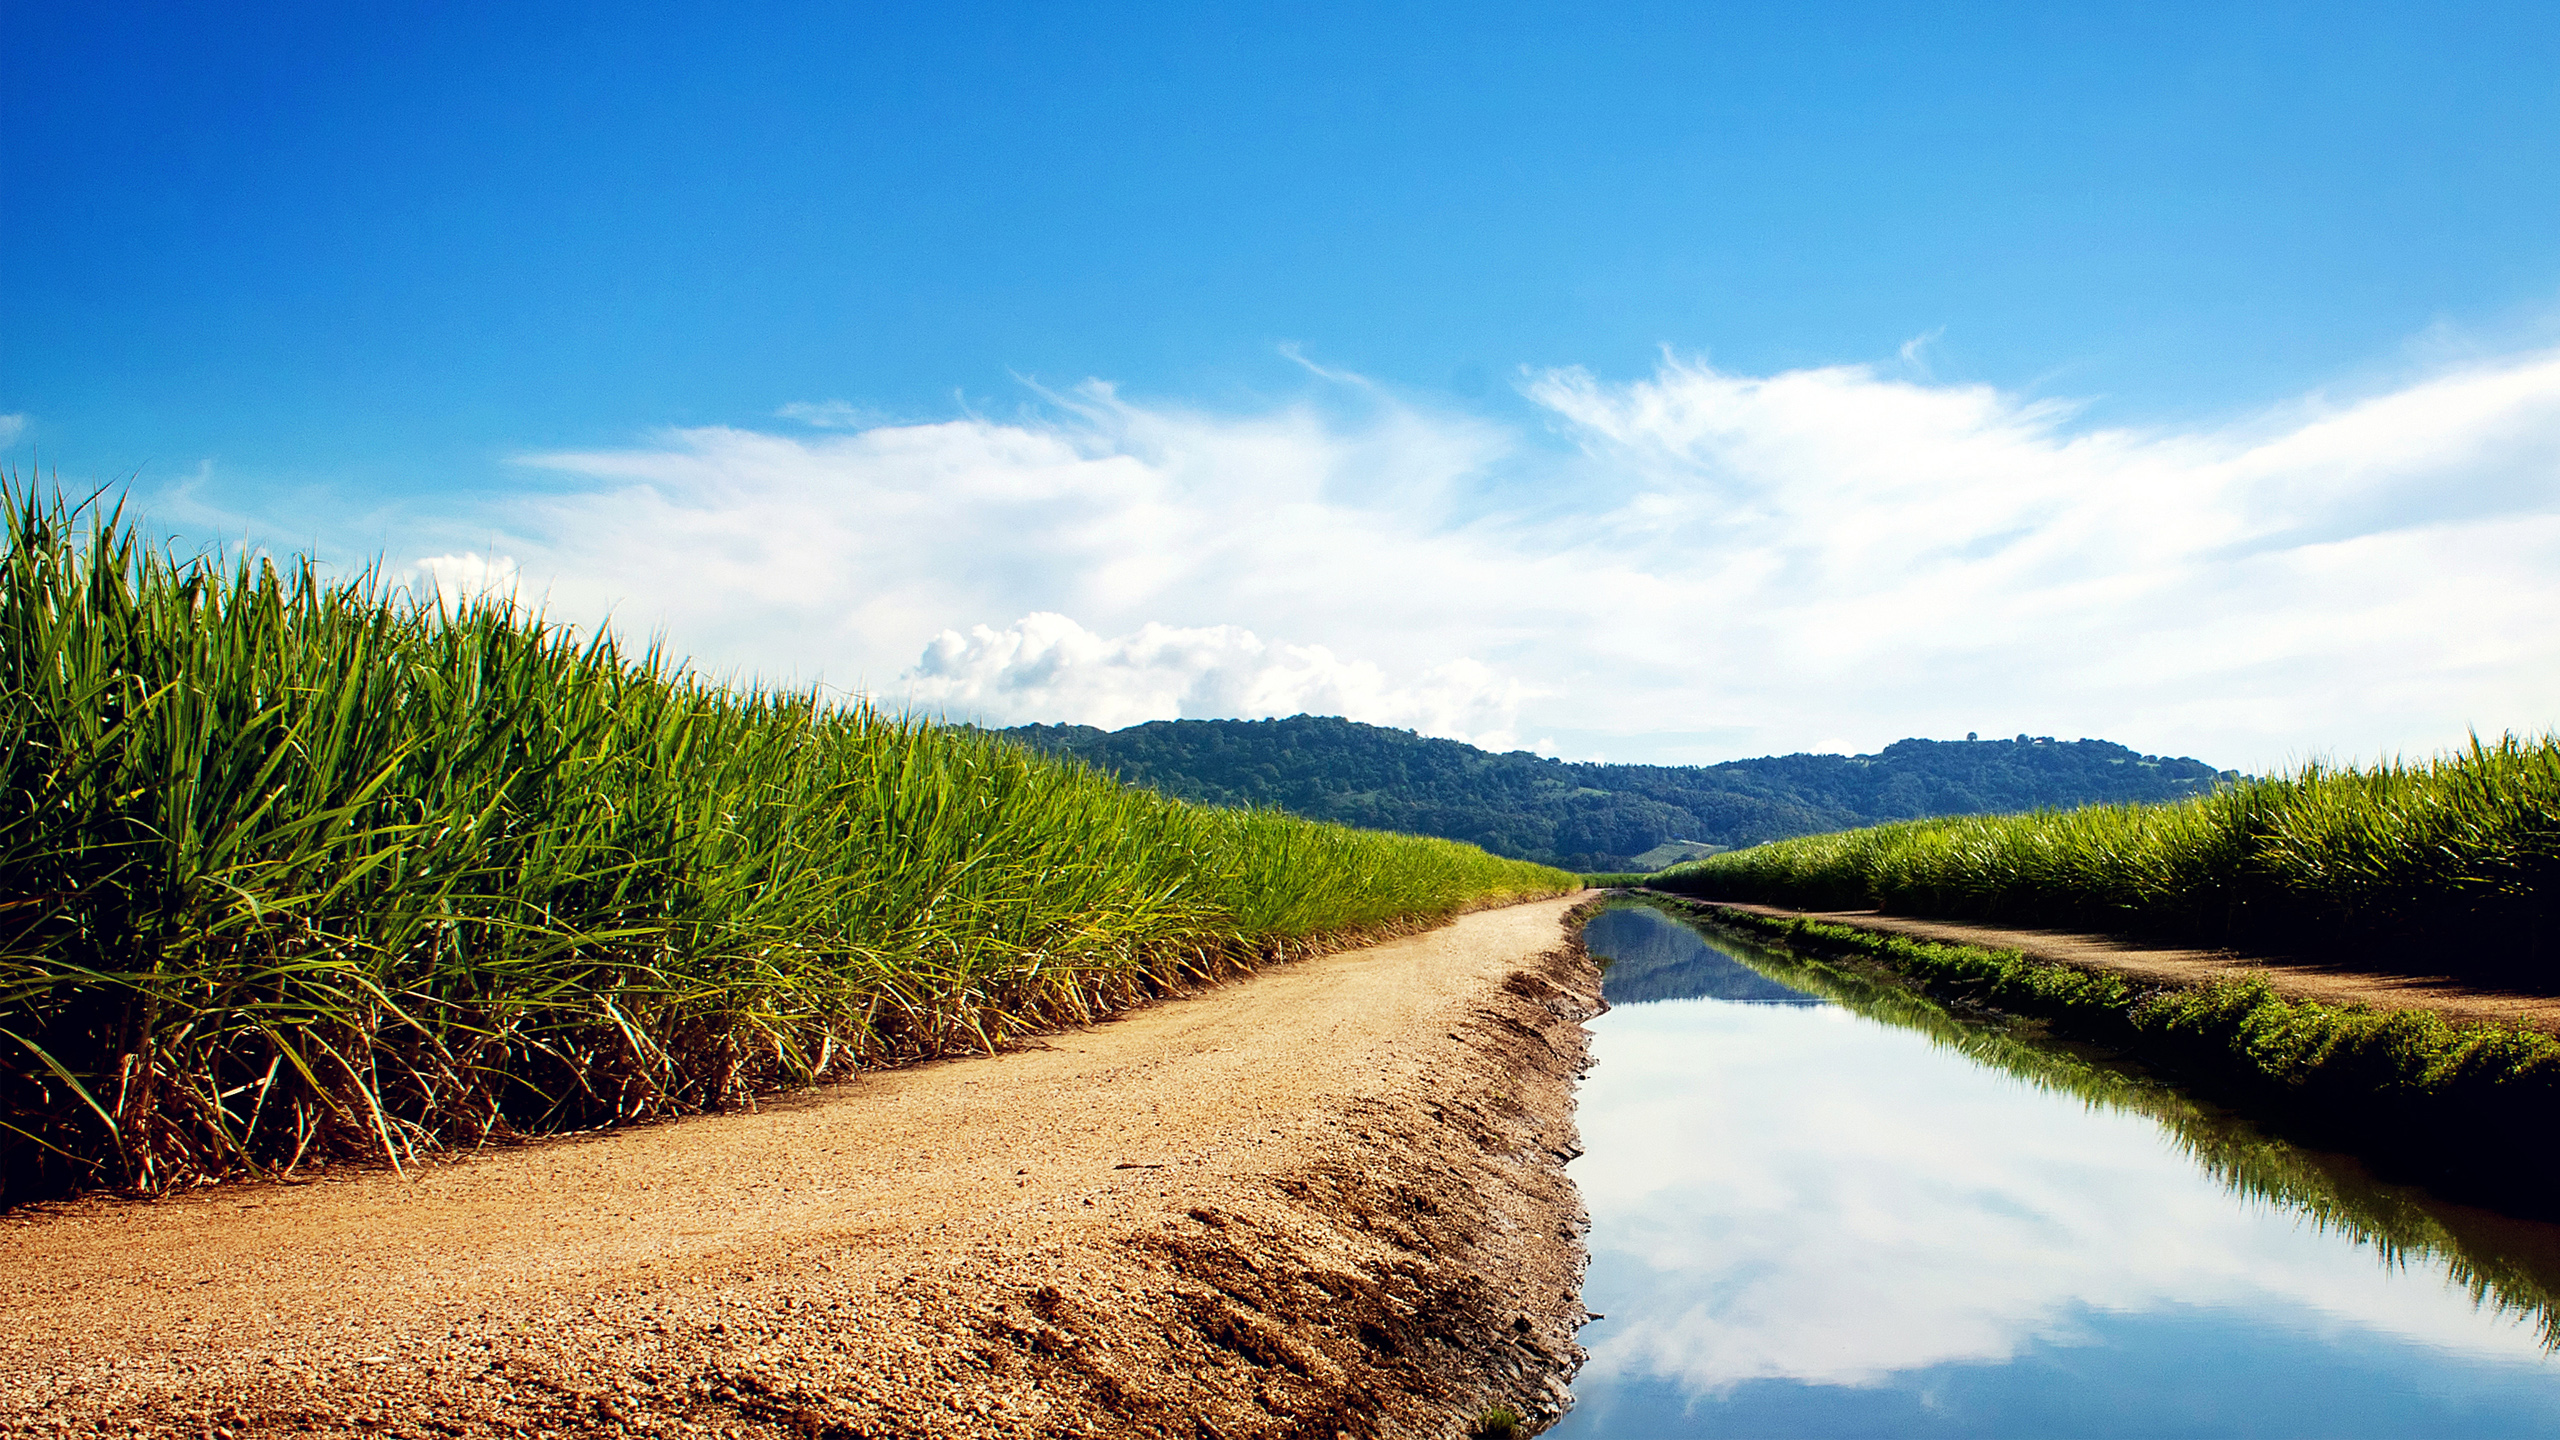 HD Wallpapers Sugarcane Fields